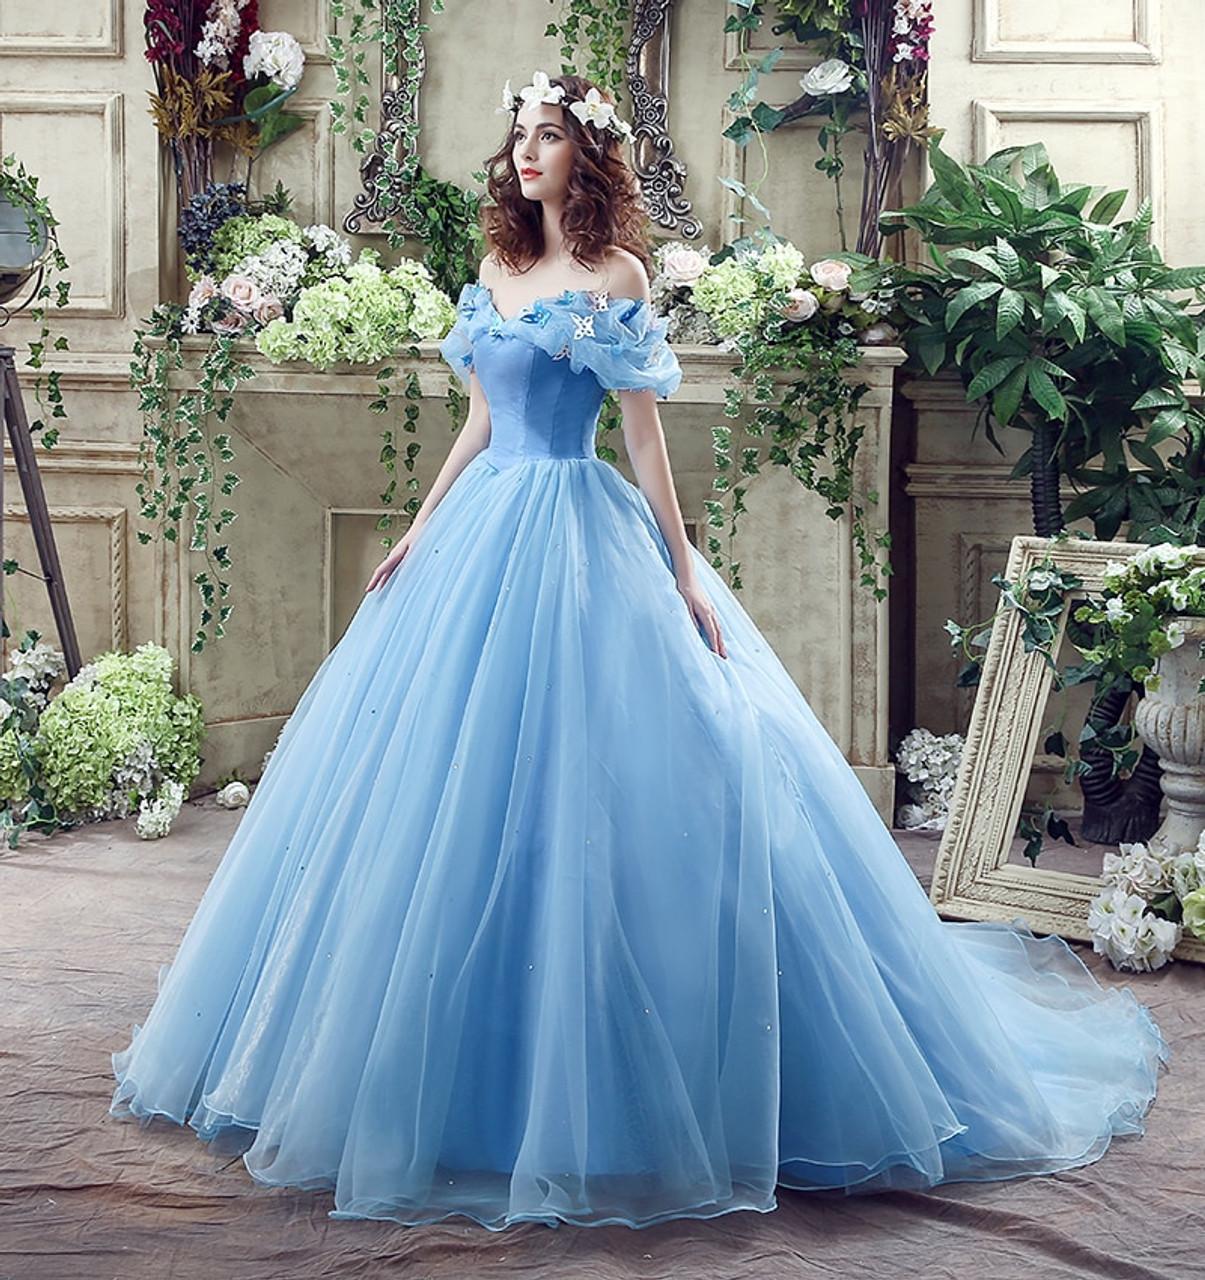 Wedding Dresses Cinderella